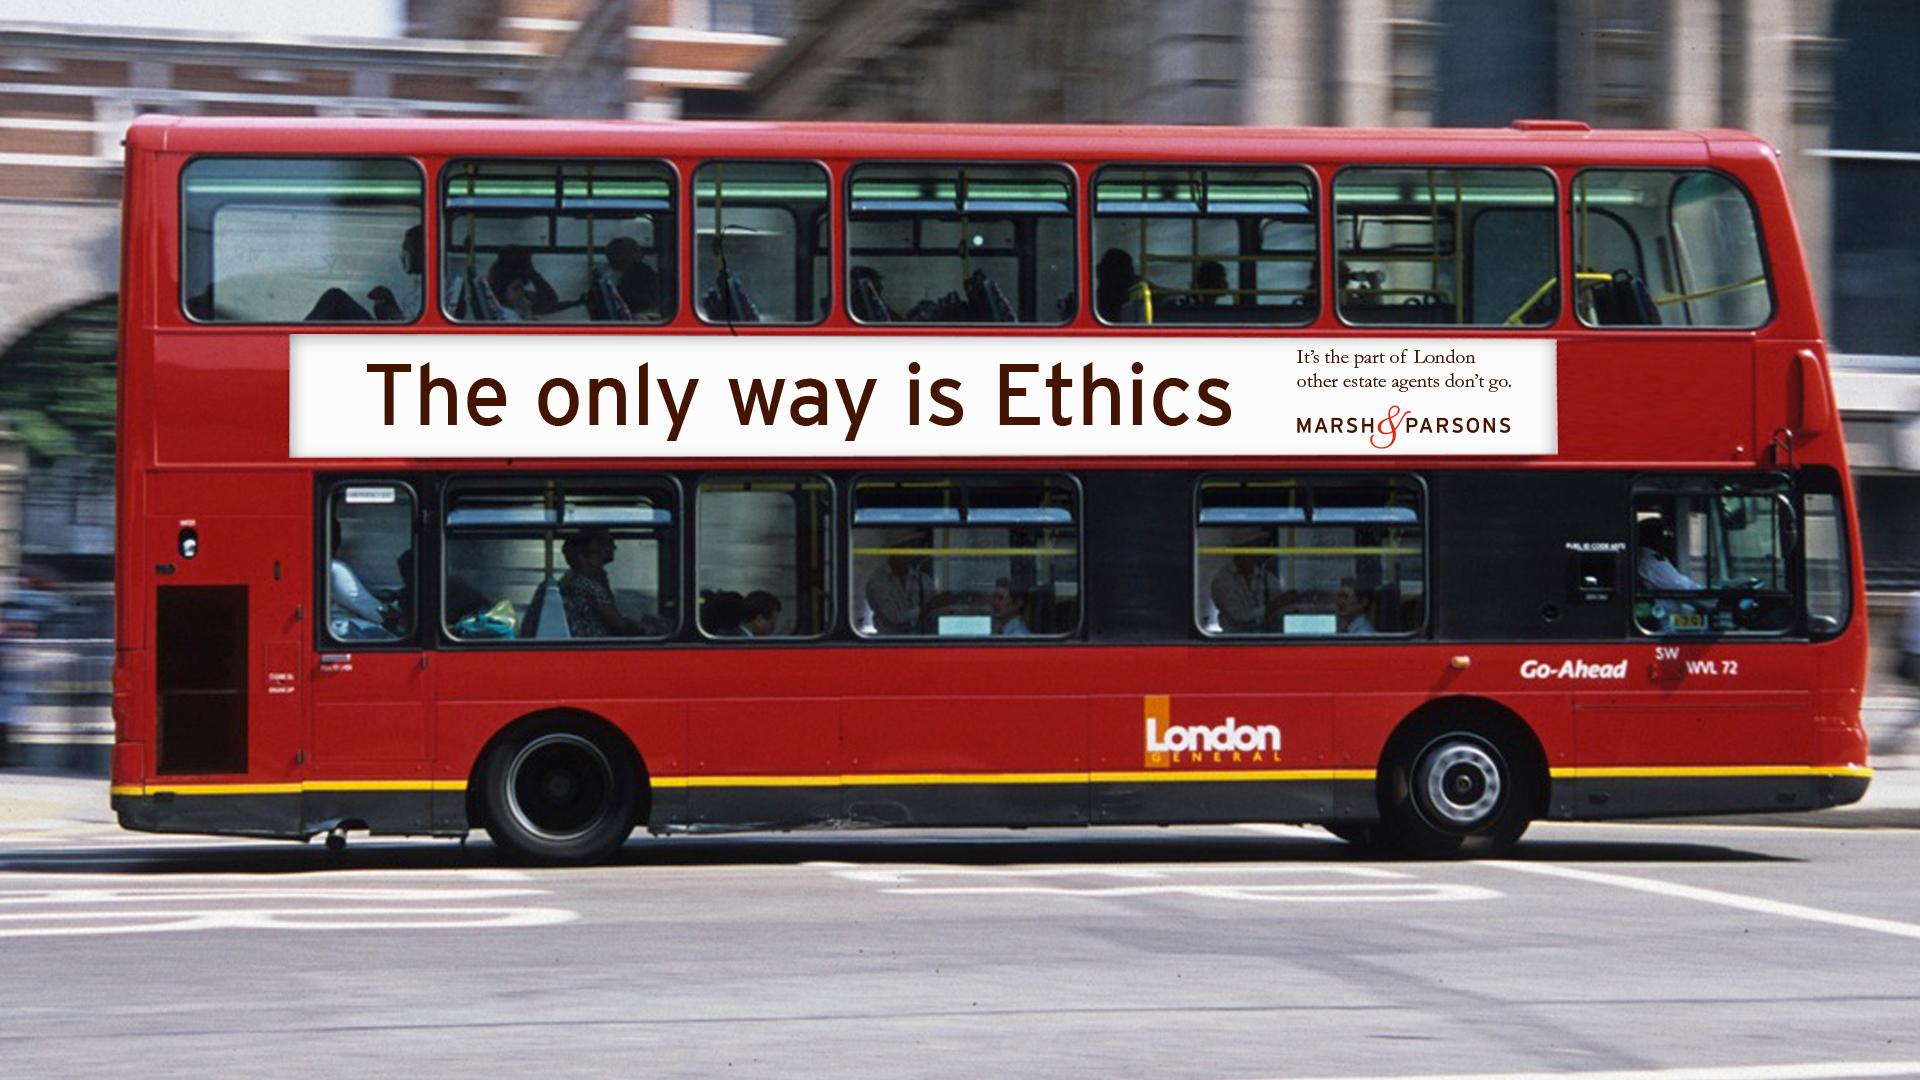 M&P_ETHICS_bus.jpg